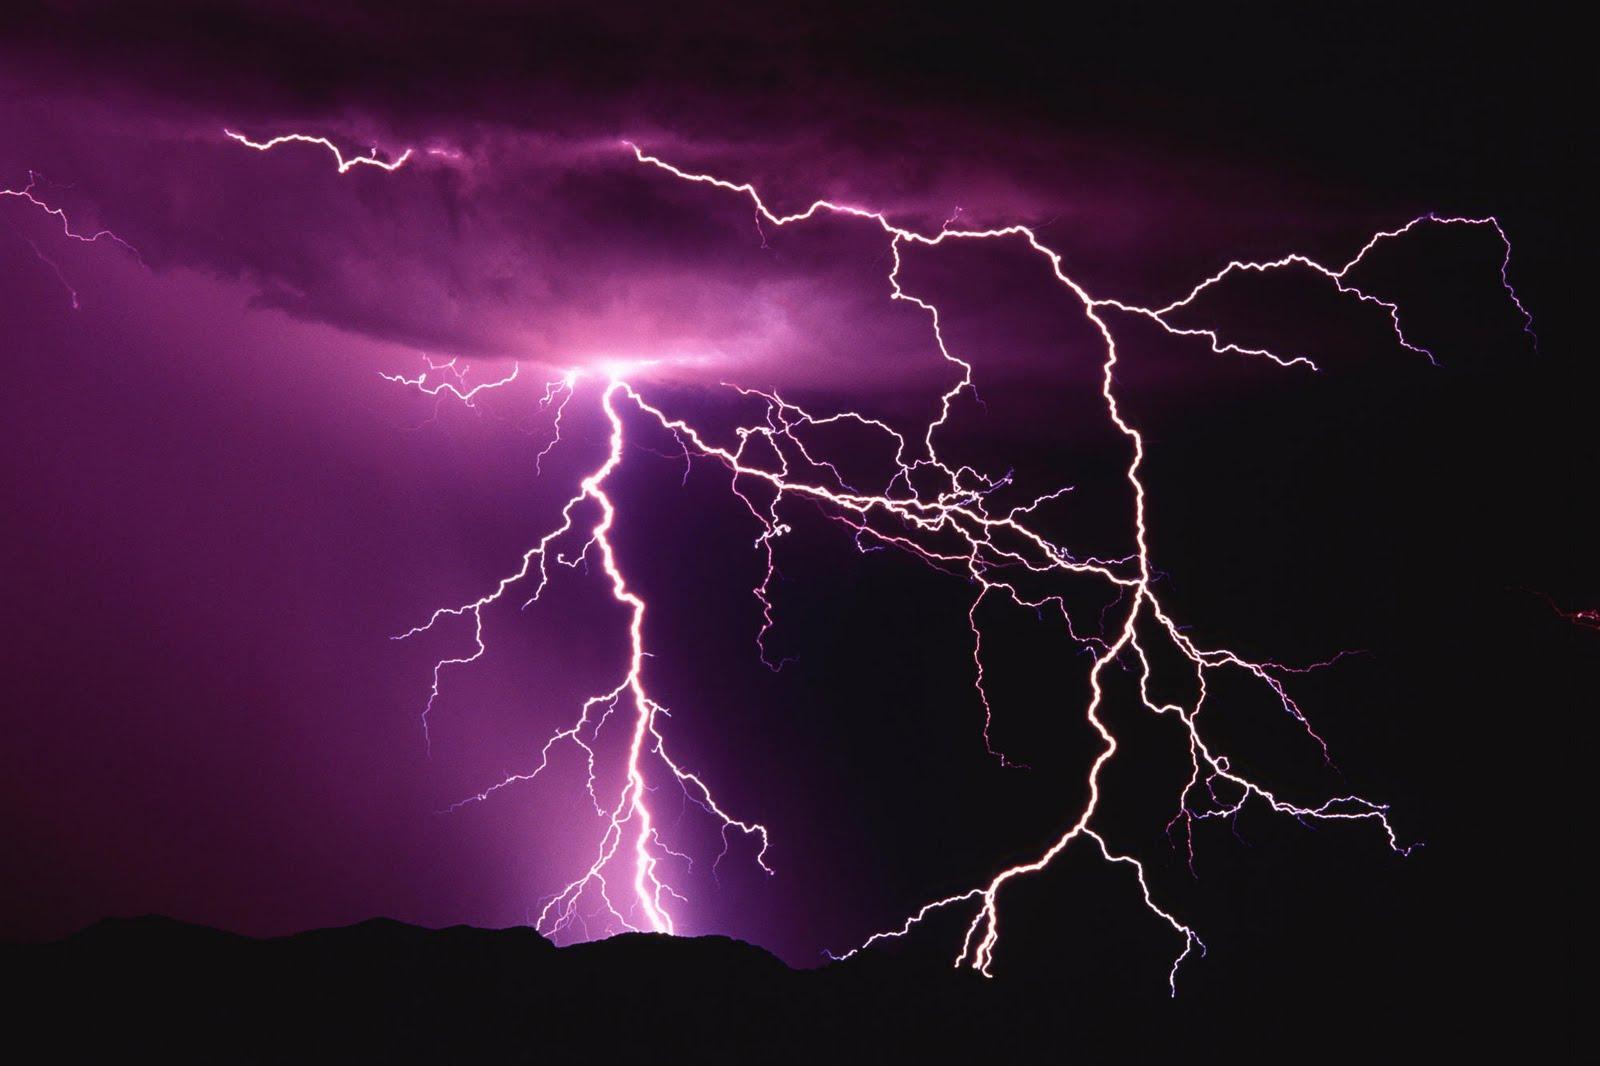 http://3.bp.blogspot.com/_SWYwL3fIkFs/S-aatoXkEHI/AAAAAAAAEr0/JdLXSfBEDxk/s1600/purple+sky+lightning.jpg